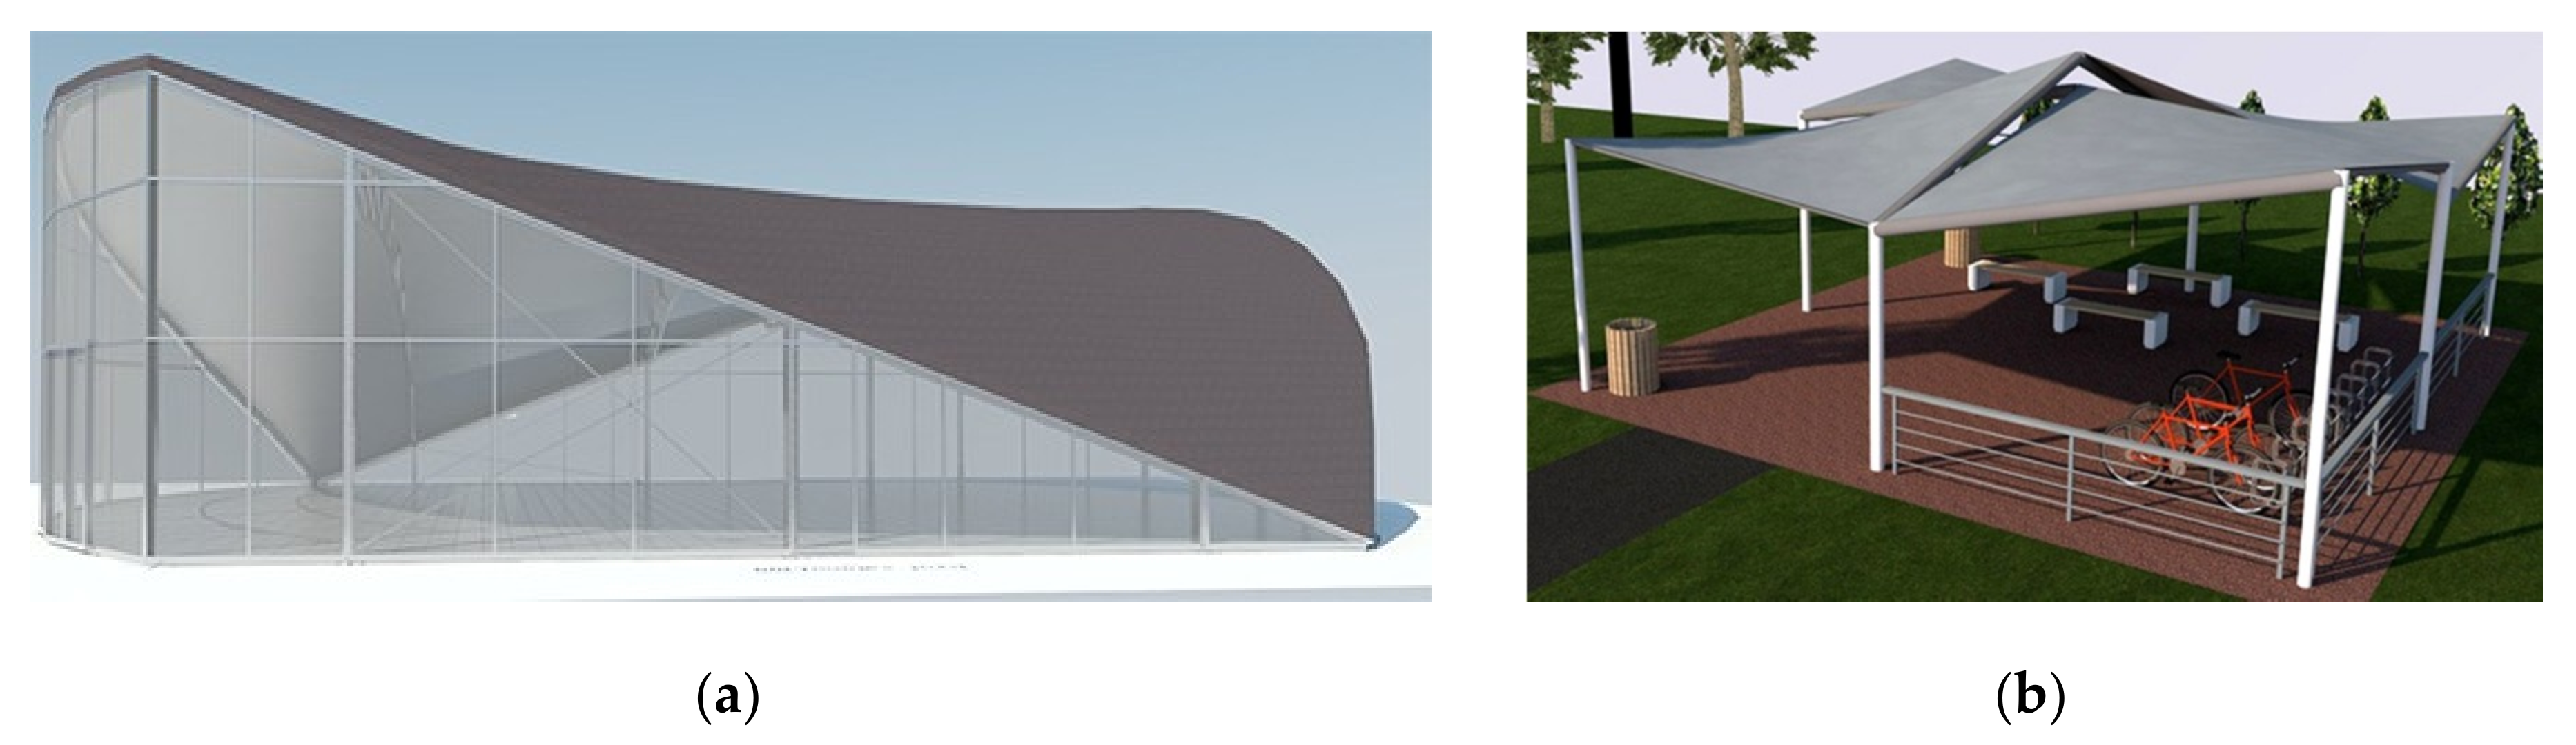 Buildings | Free Full-Text | Responsive Parametric Building